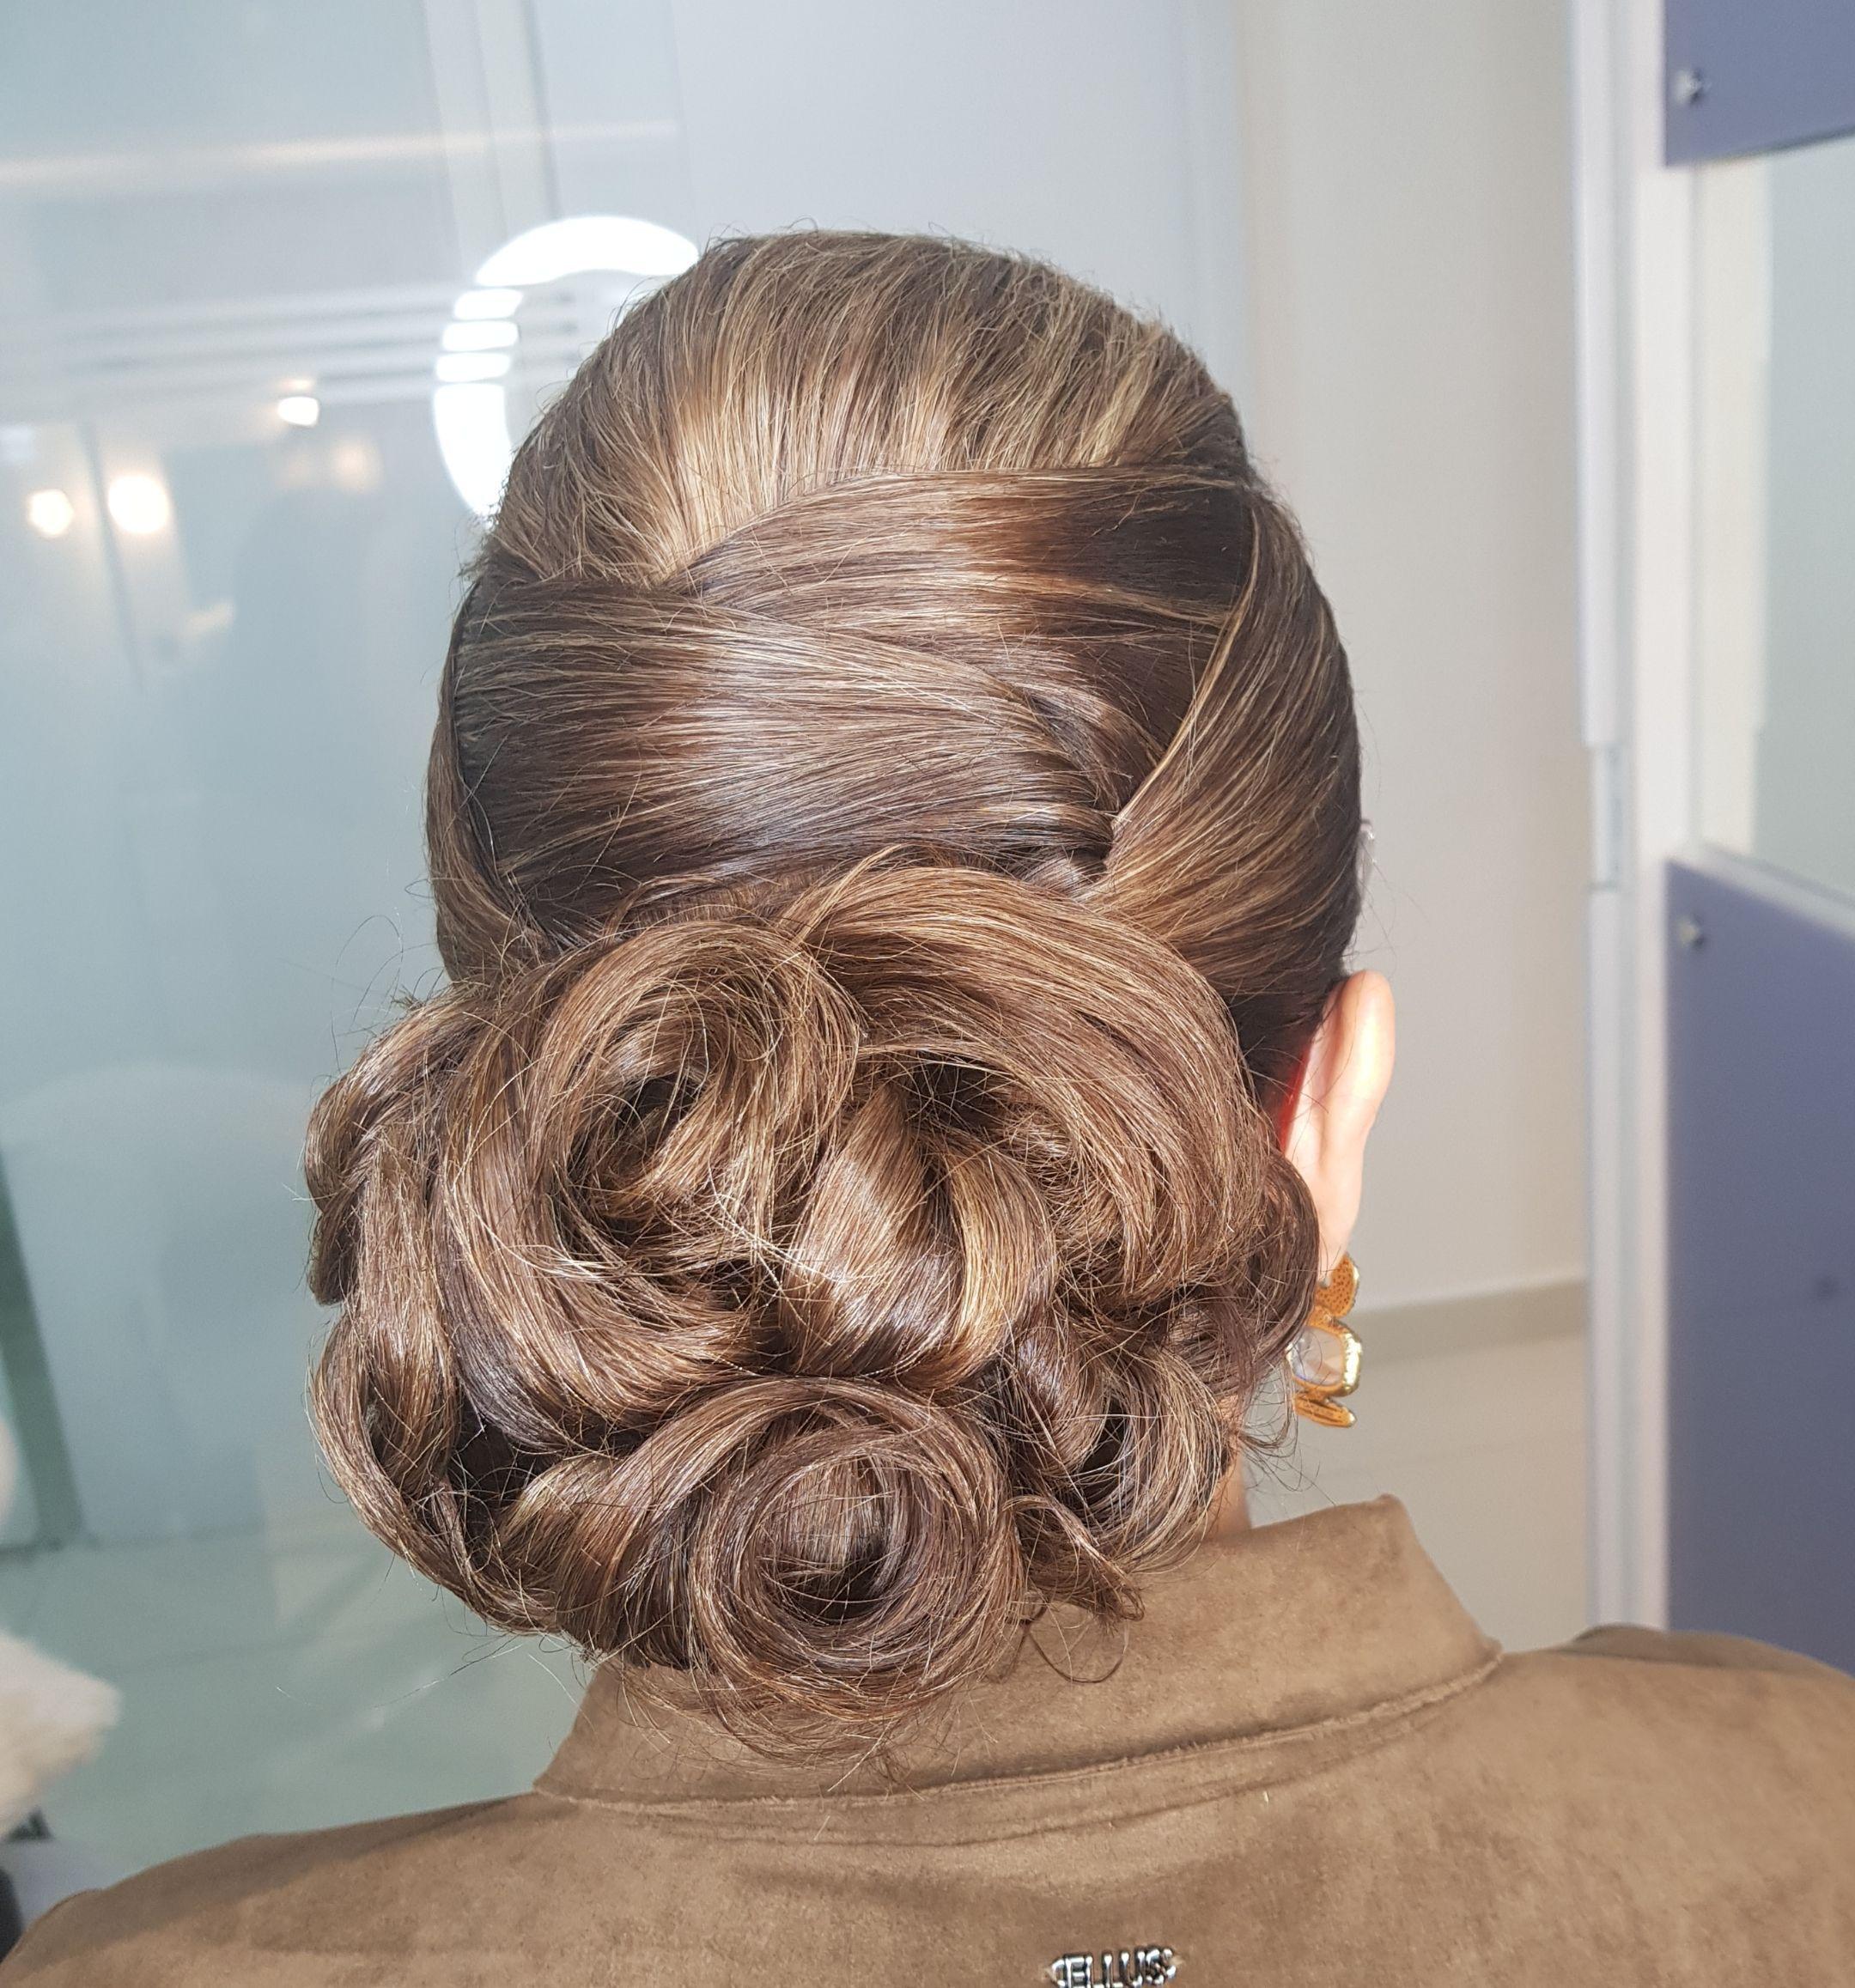 cabeleireiro(a) cabeleireiro(a) cabeleireiro(a) cabeleireiro(a)